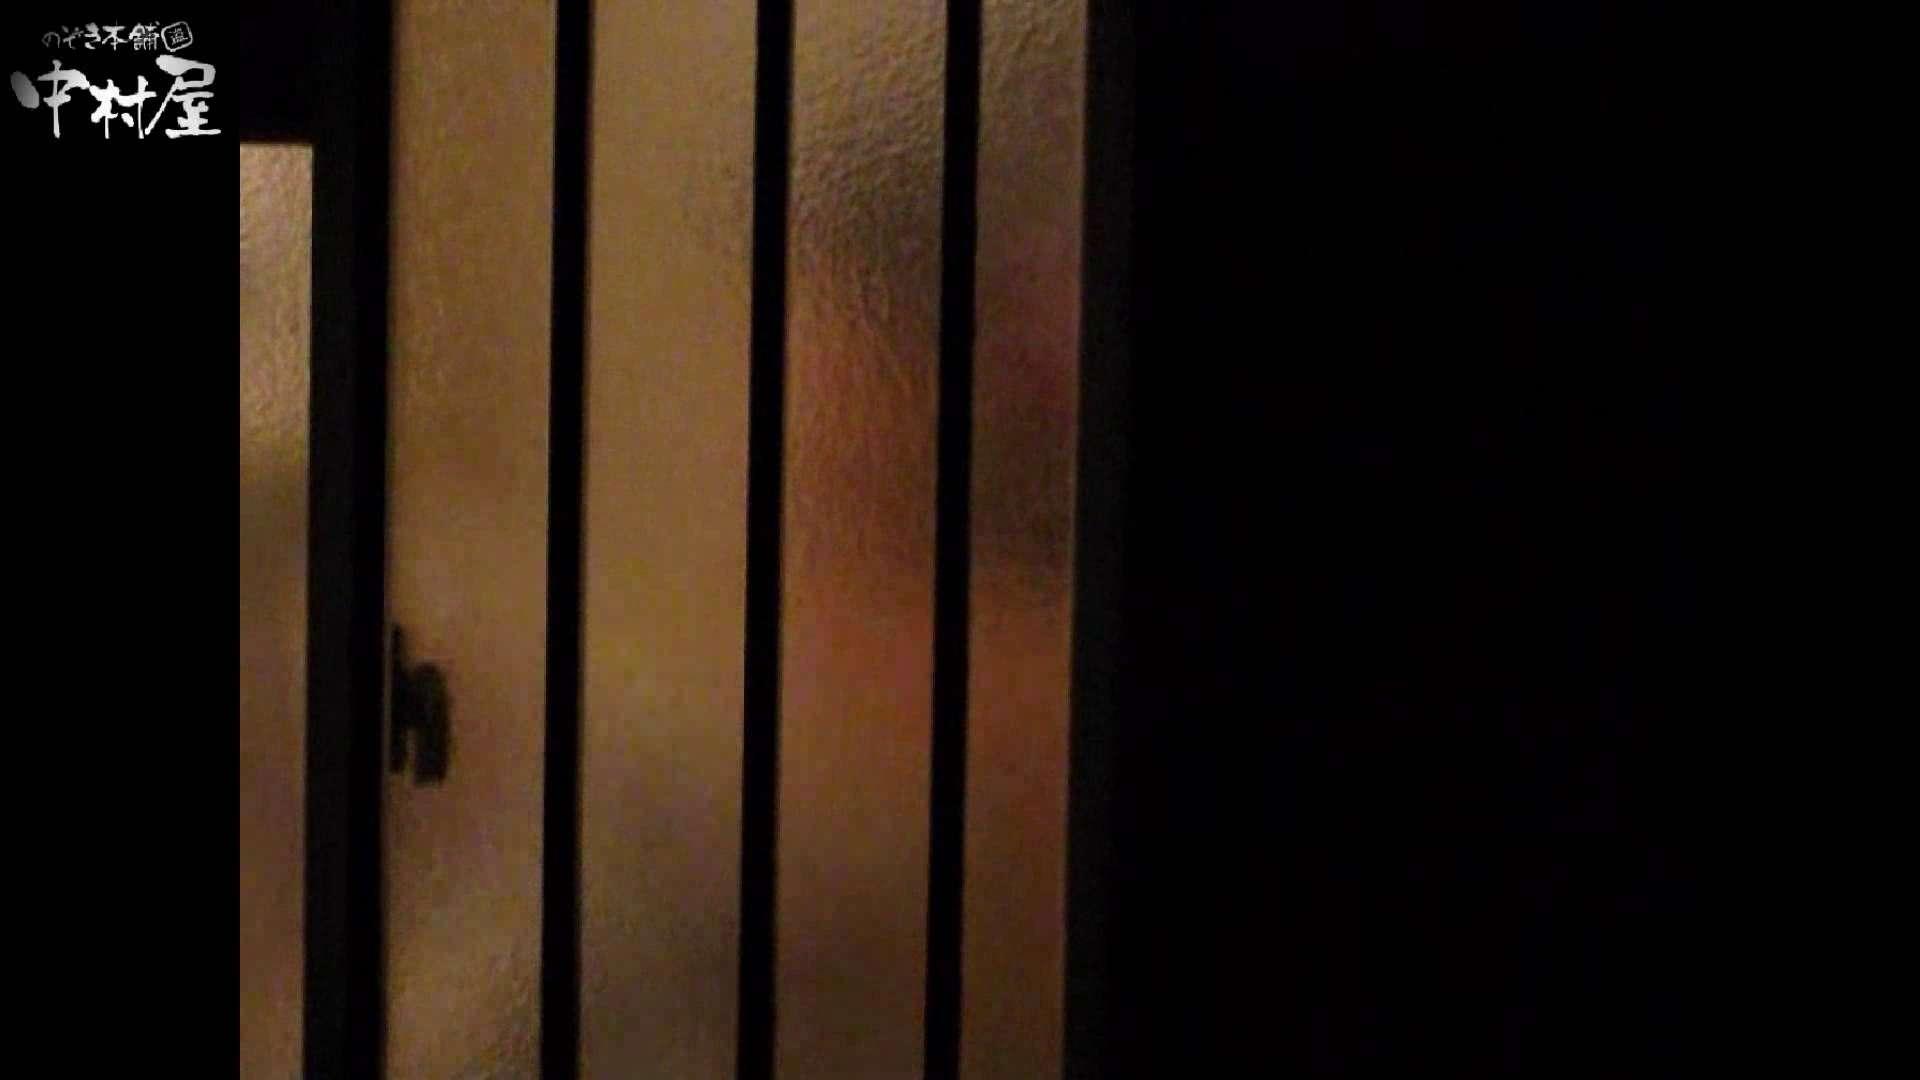 民家風呂専門盗撮師の超危険映像 vol.003 美少女ヌード   盗撮  58pic 9